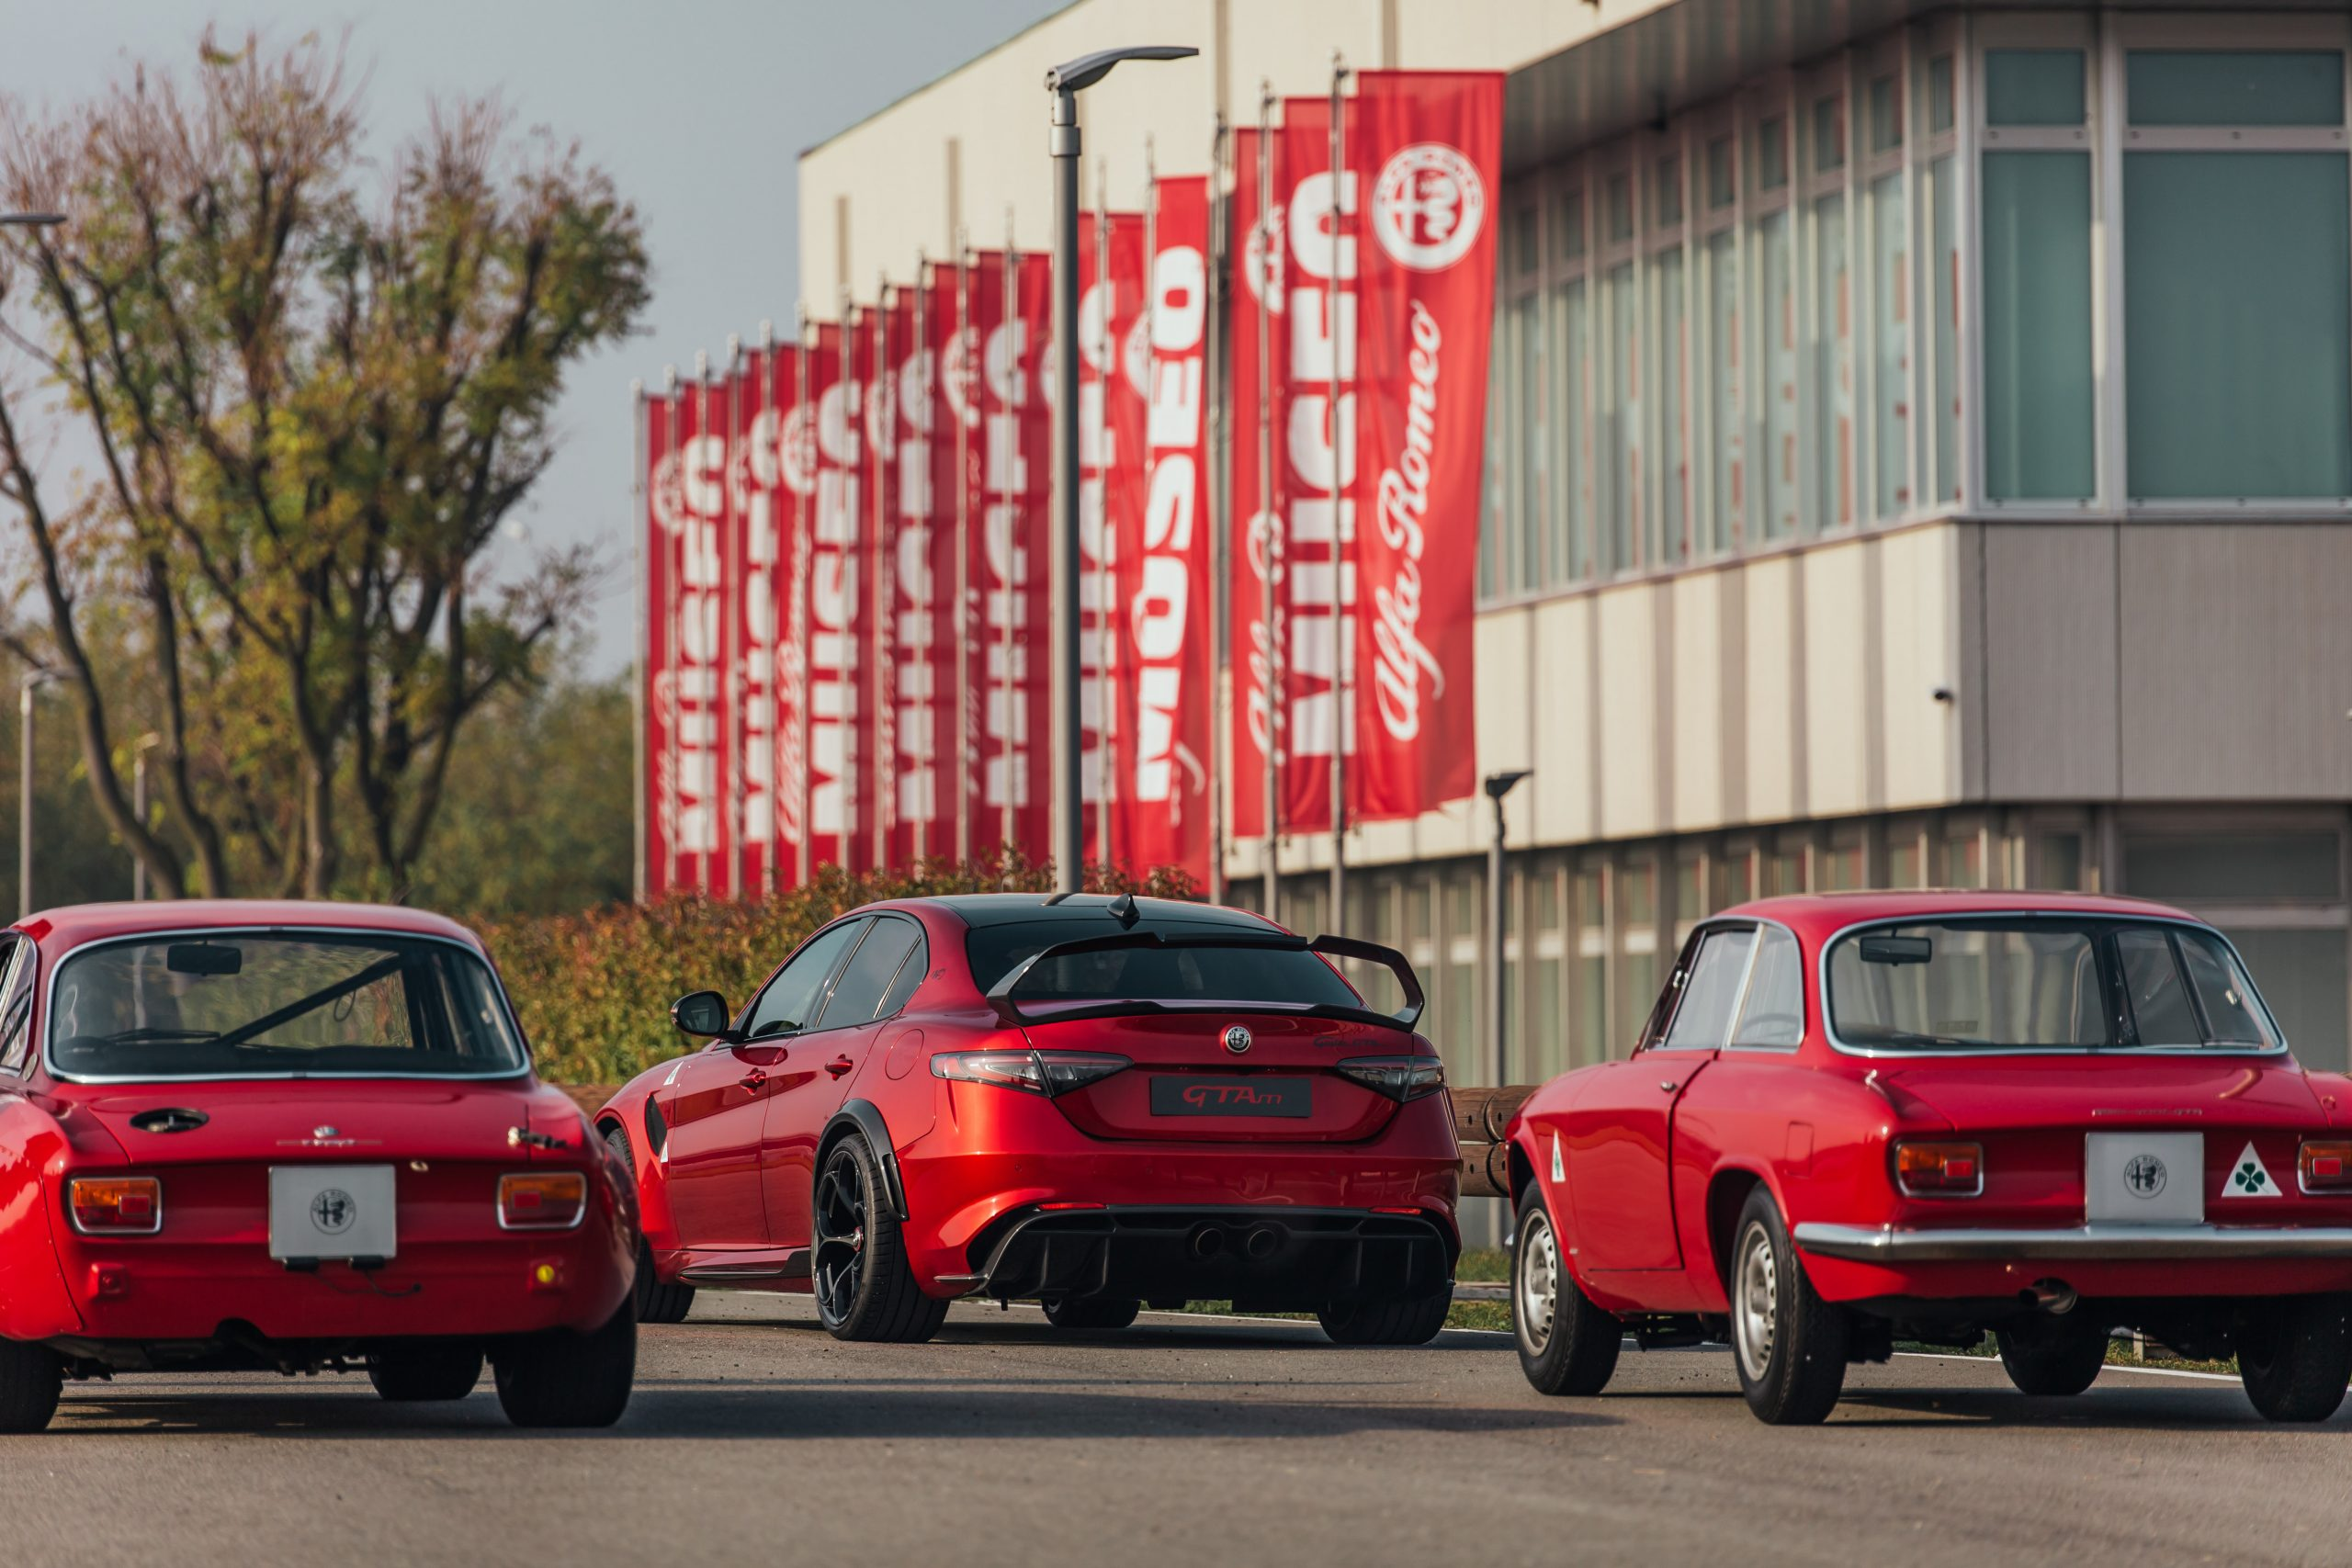 210610 AR 111 Anniversary 04 scaled H Alfa Romeo προσκαλεί τους Alfisti για τα 111α γενέθλια της Alfa, alfa romeo, Alfa Romeo Giulia, Alfa Romeo Giulia GTA, Alfa Romeo Giulia GTAm, ειδήσεις, Νέα